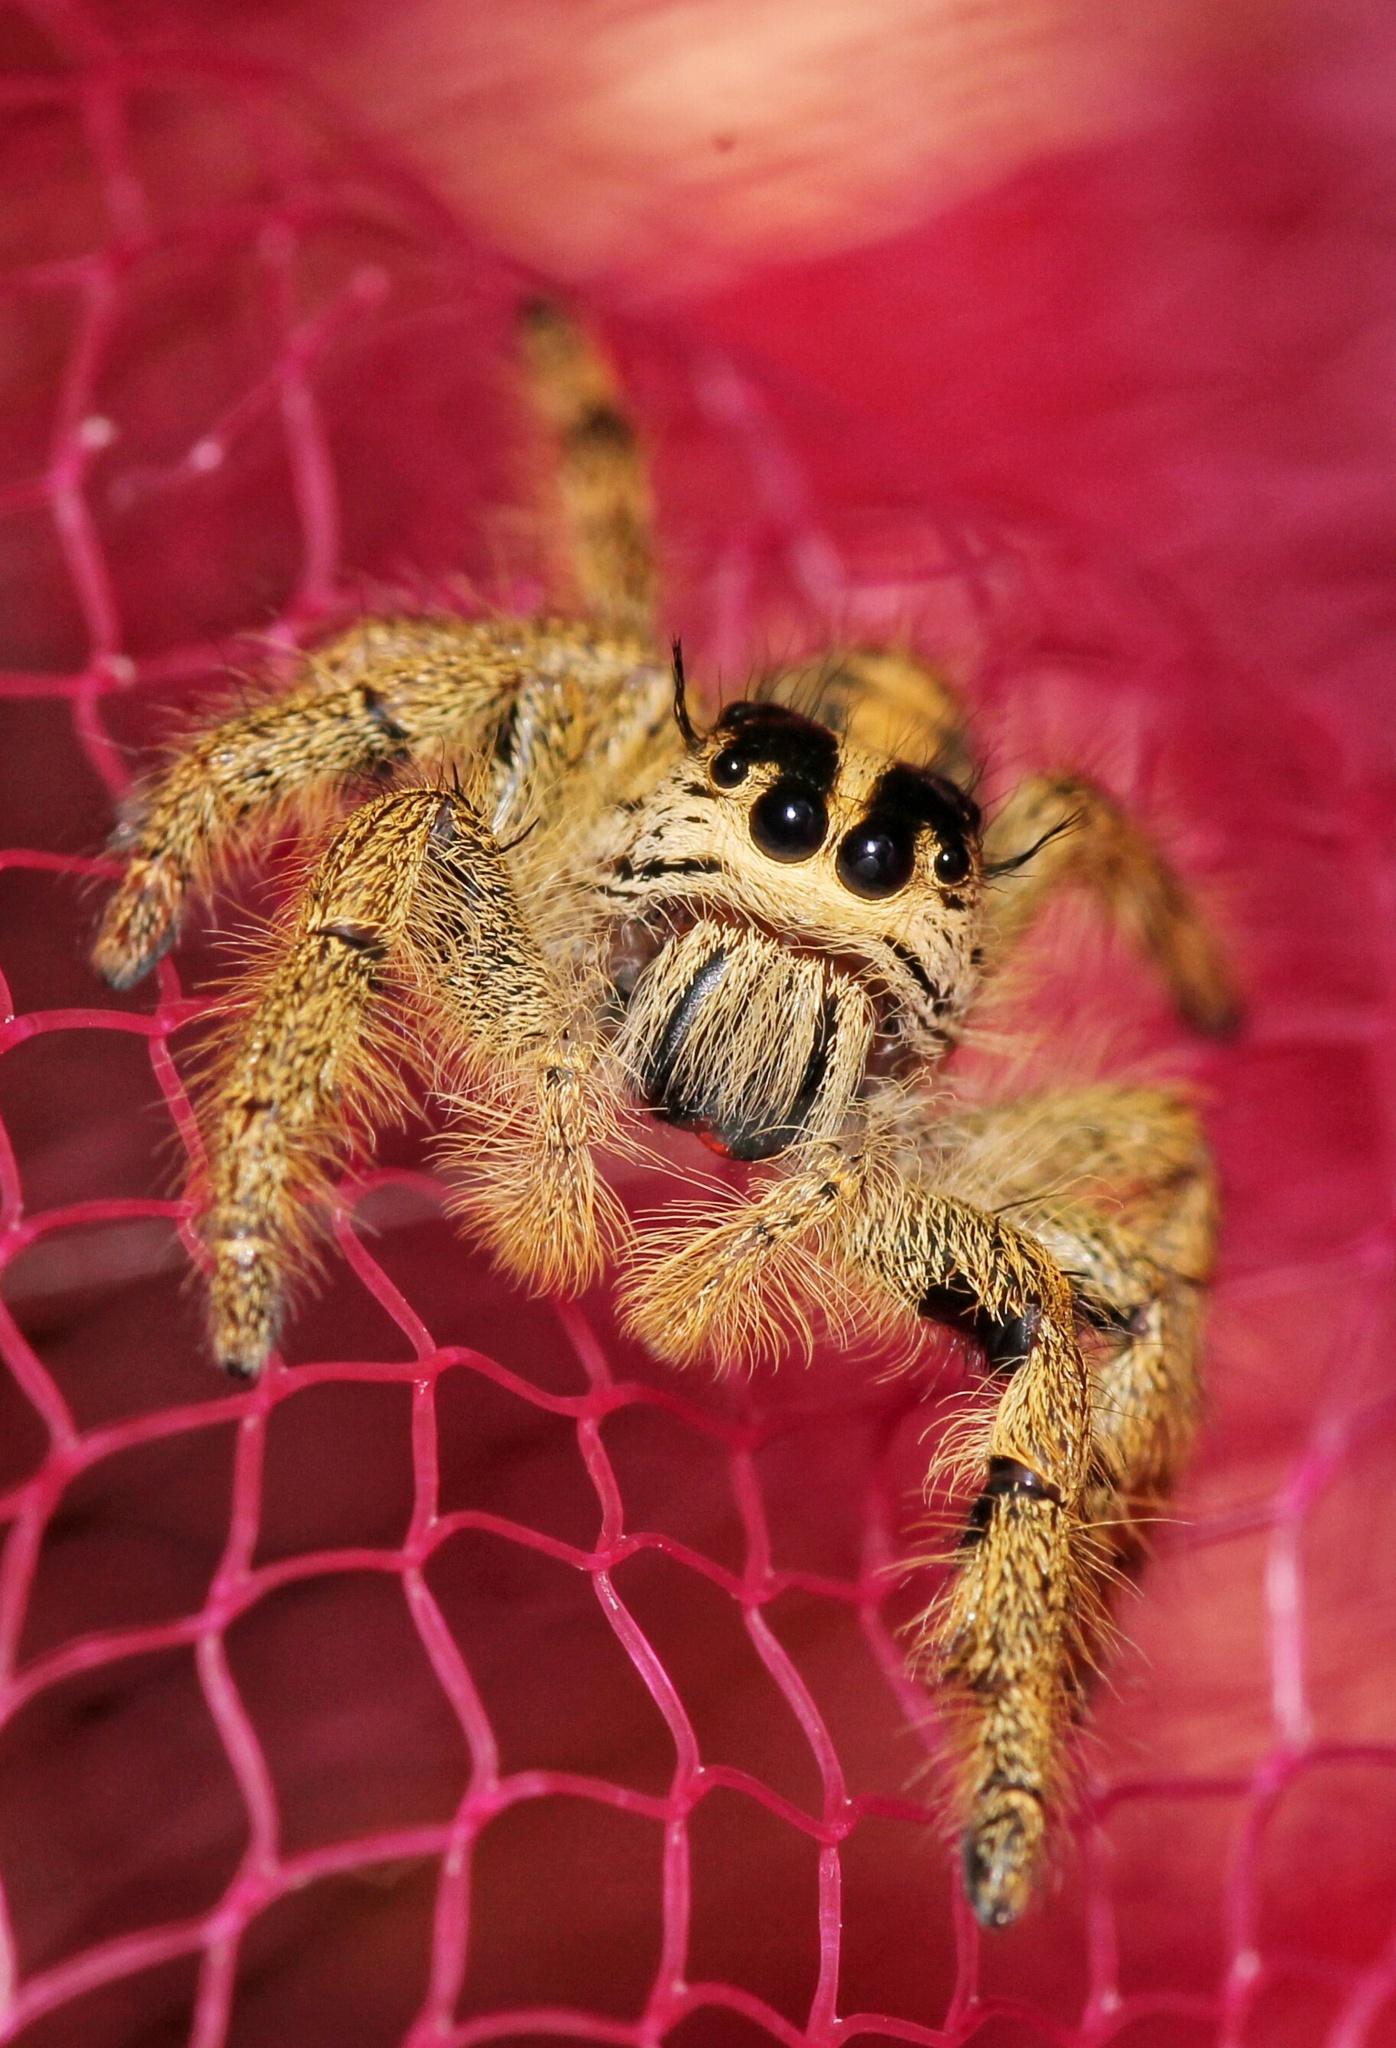 jumper spider by KangPermana